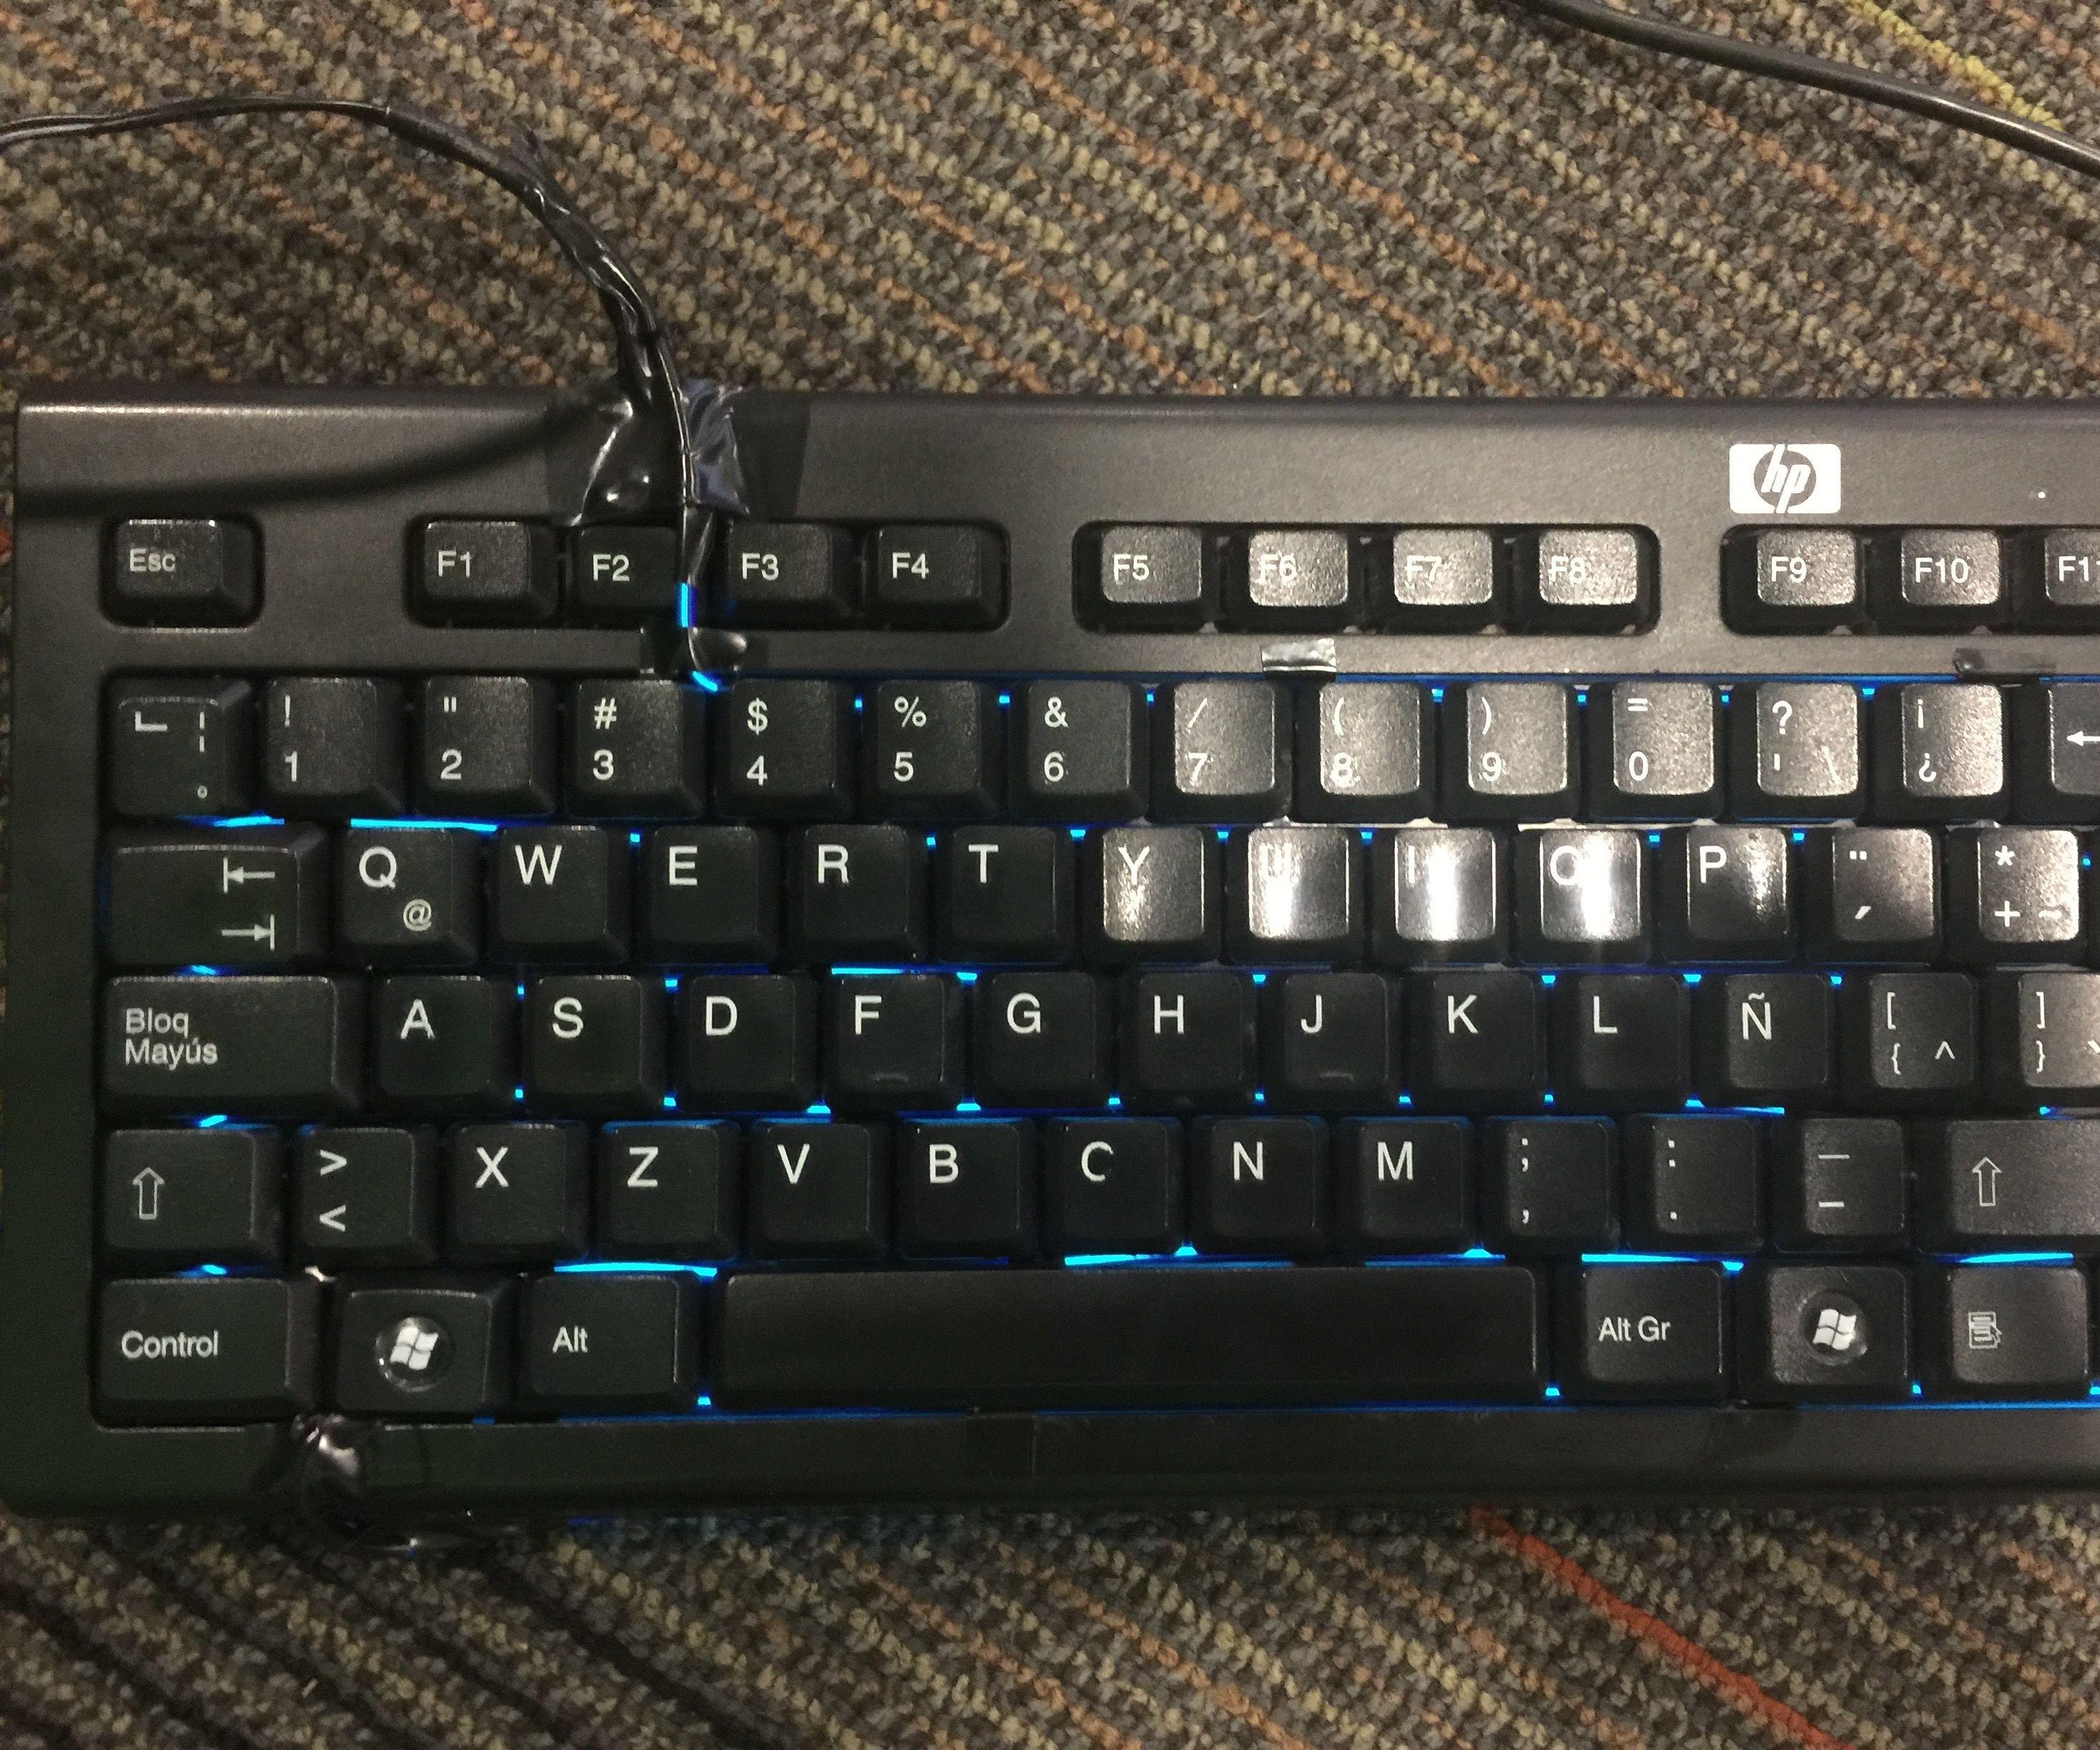 Customizing and Improving a Broken Keyboard